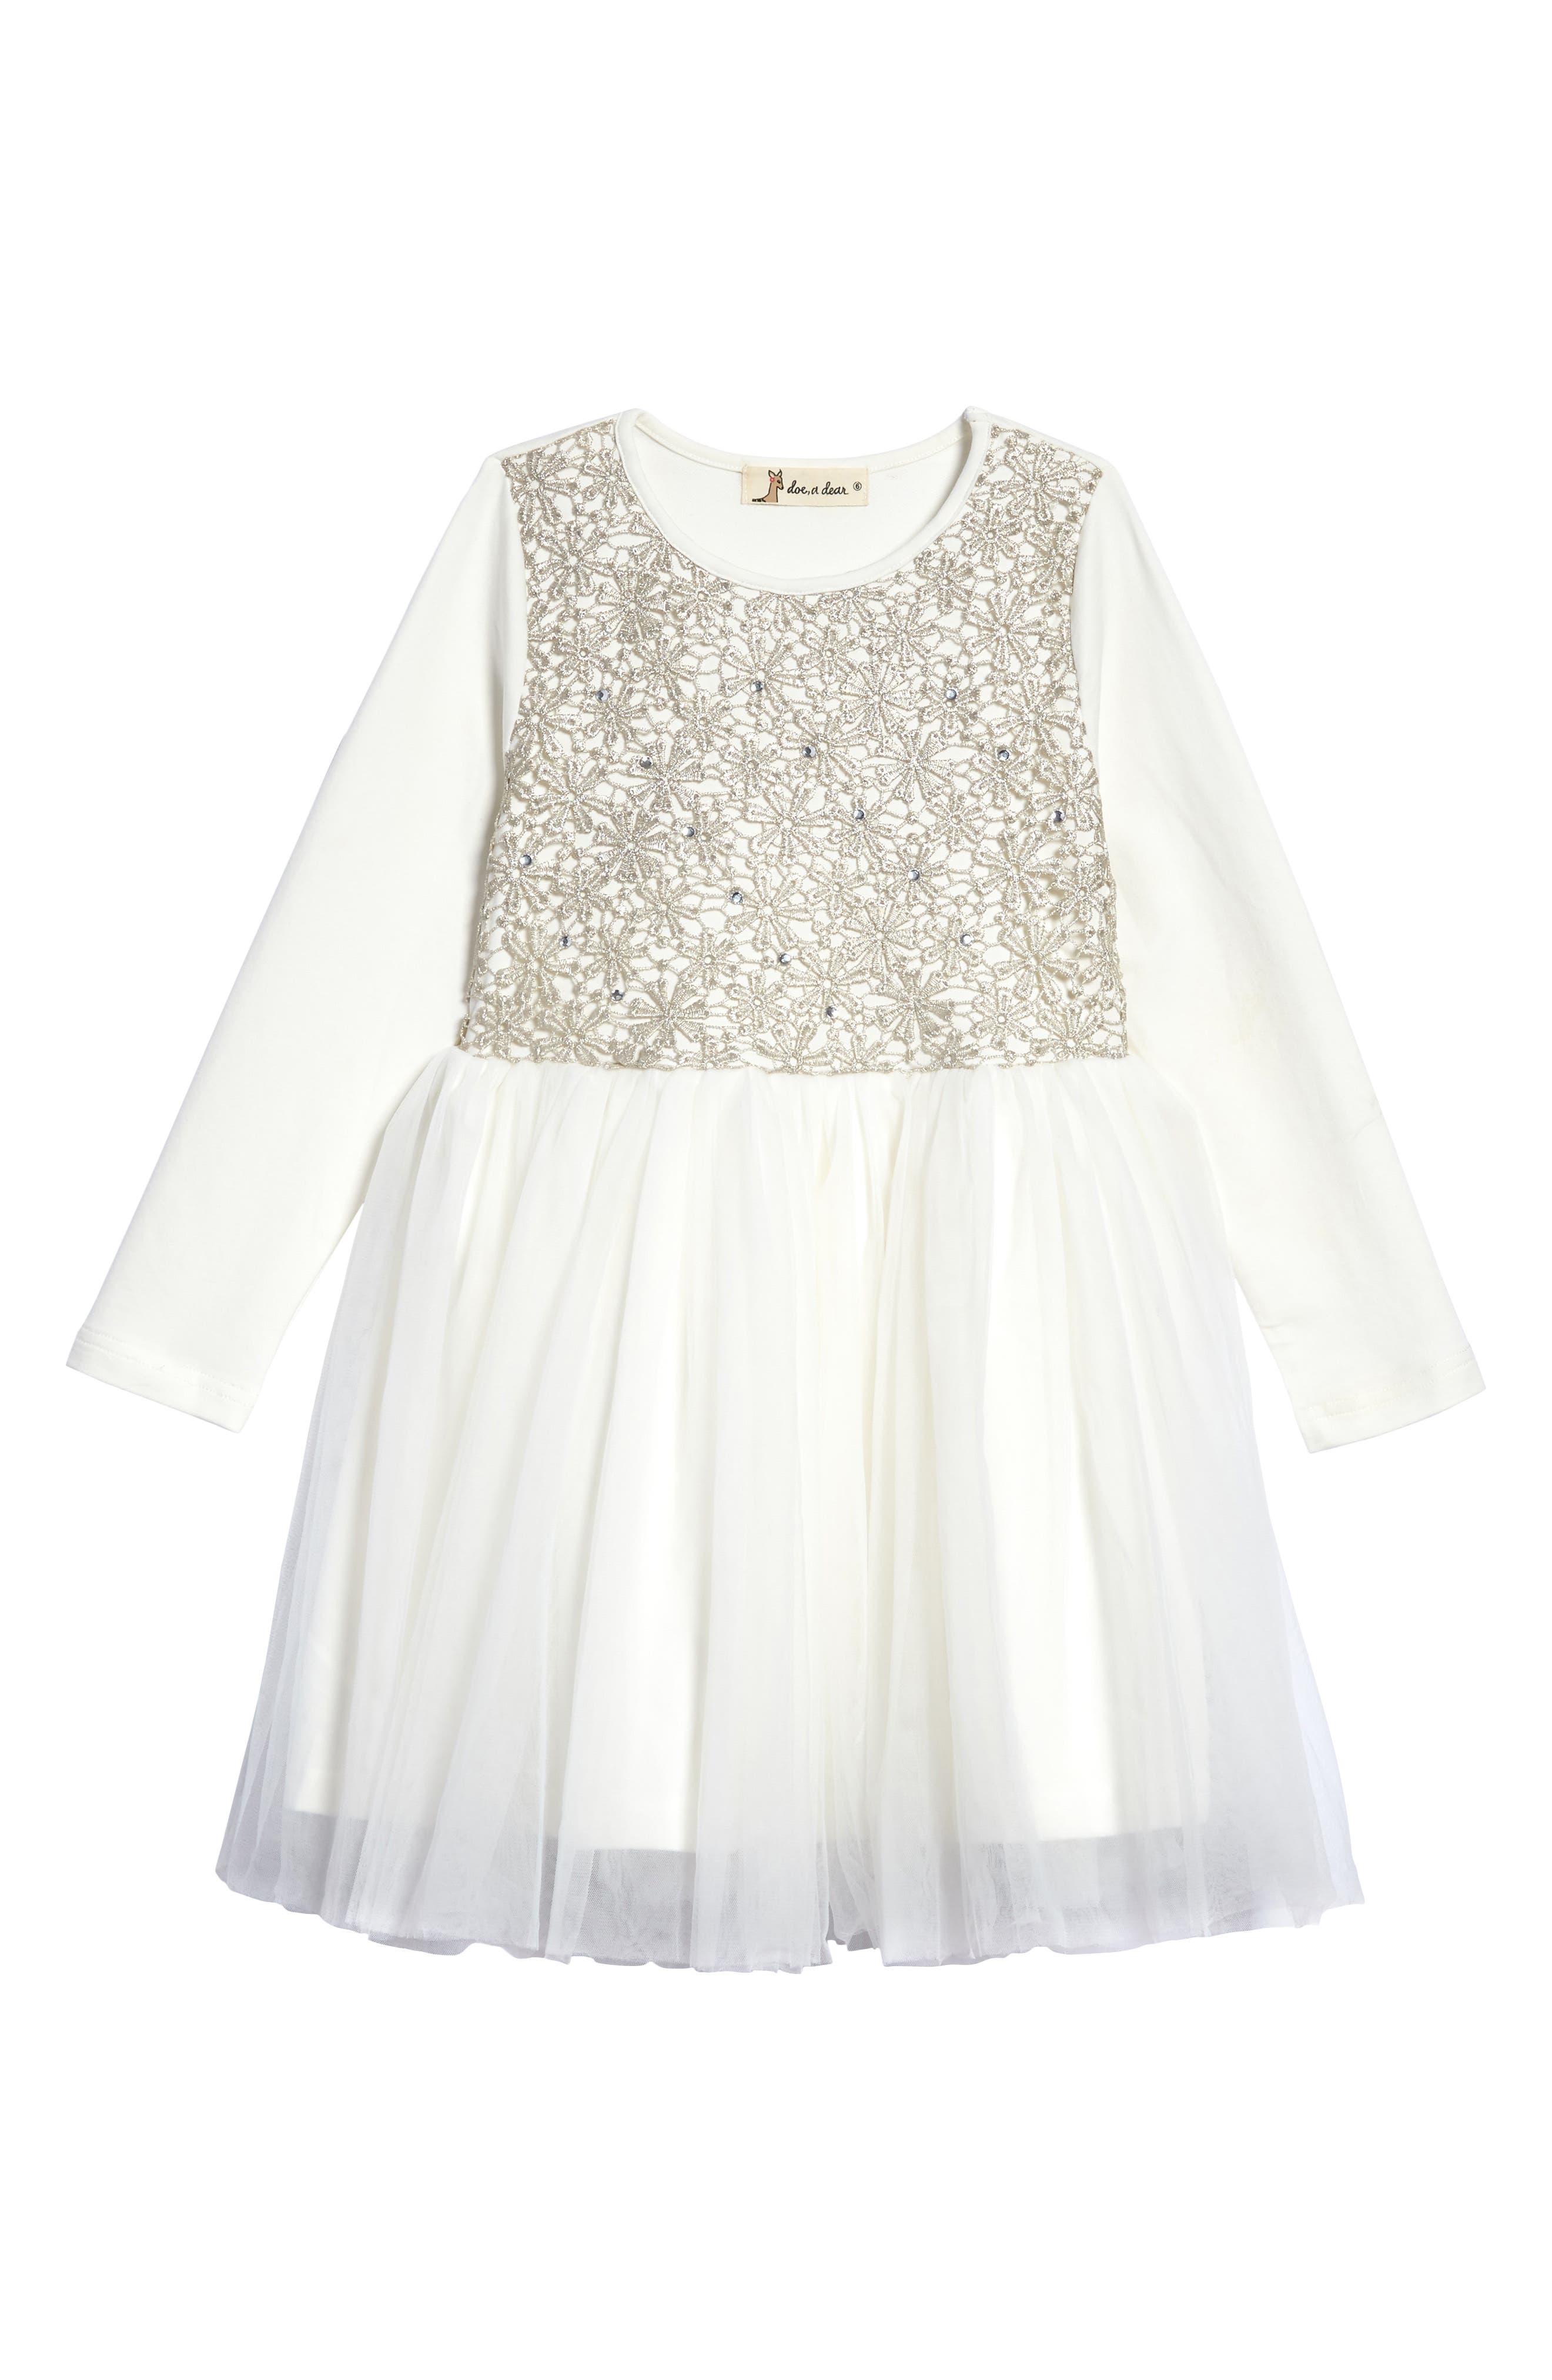 Main Image - Doe A Dear Tulle Party Dress (Toddler Girls & Little Girls)